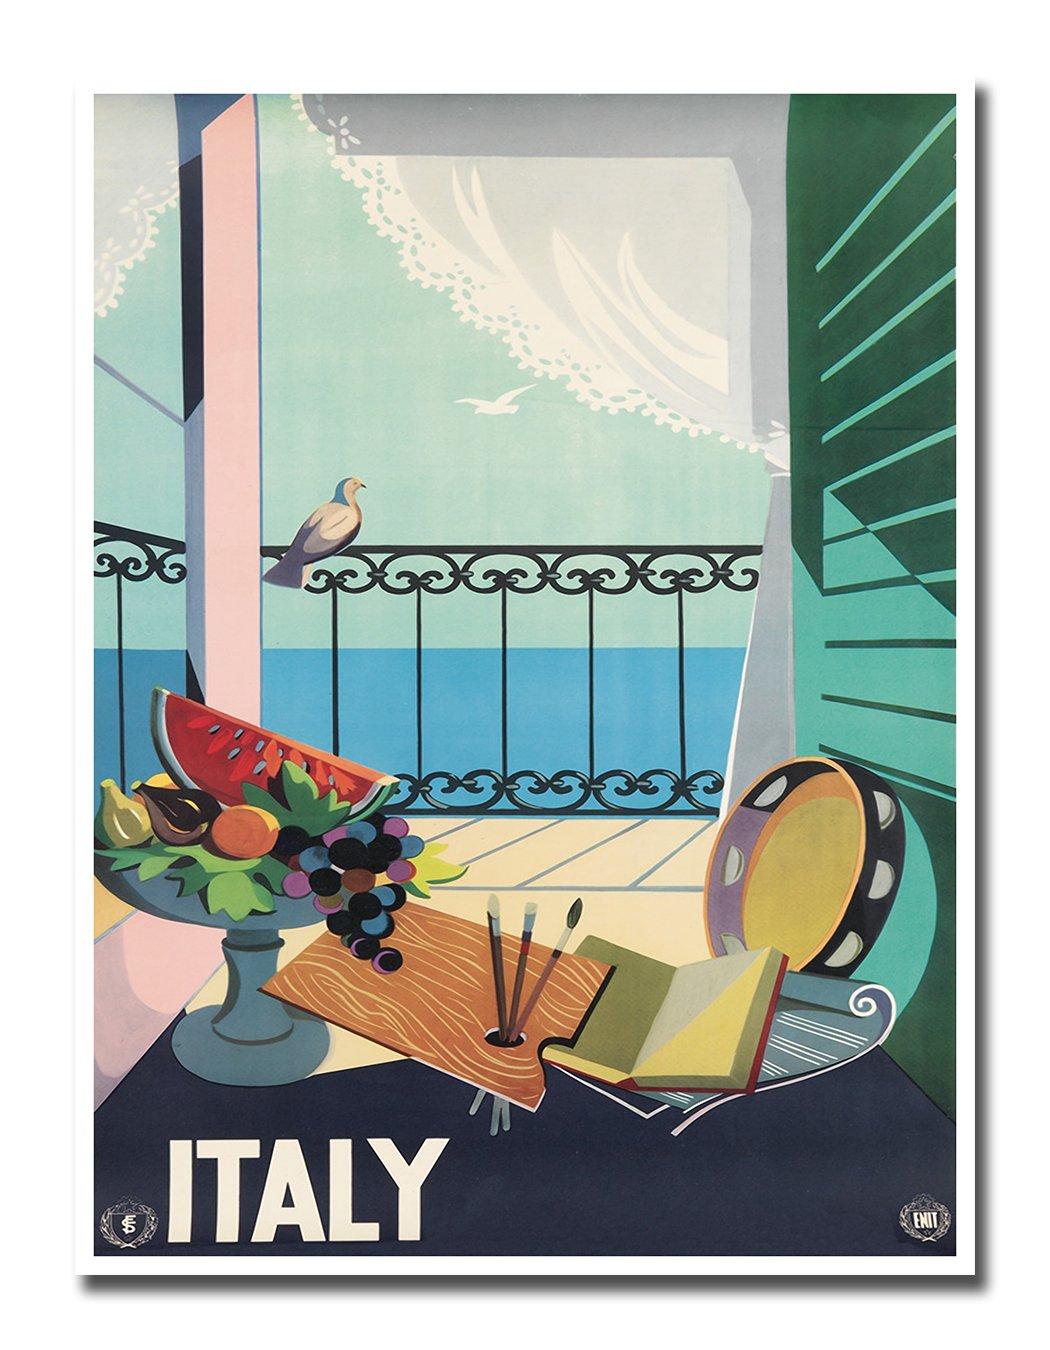 Amazon.com: Italy Poster Vintage Travel Art Retro Print Italian ...